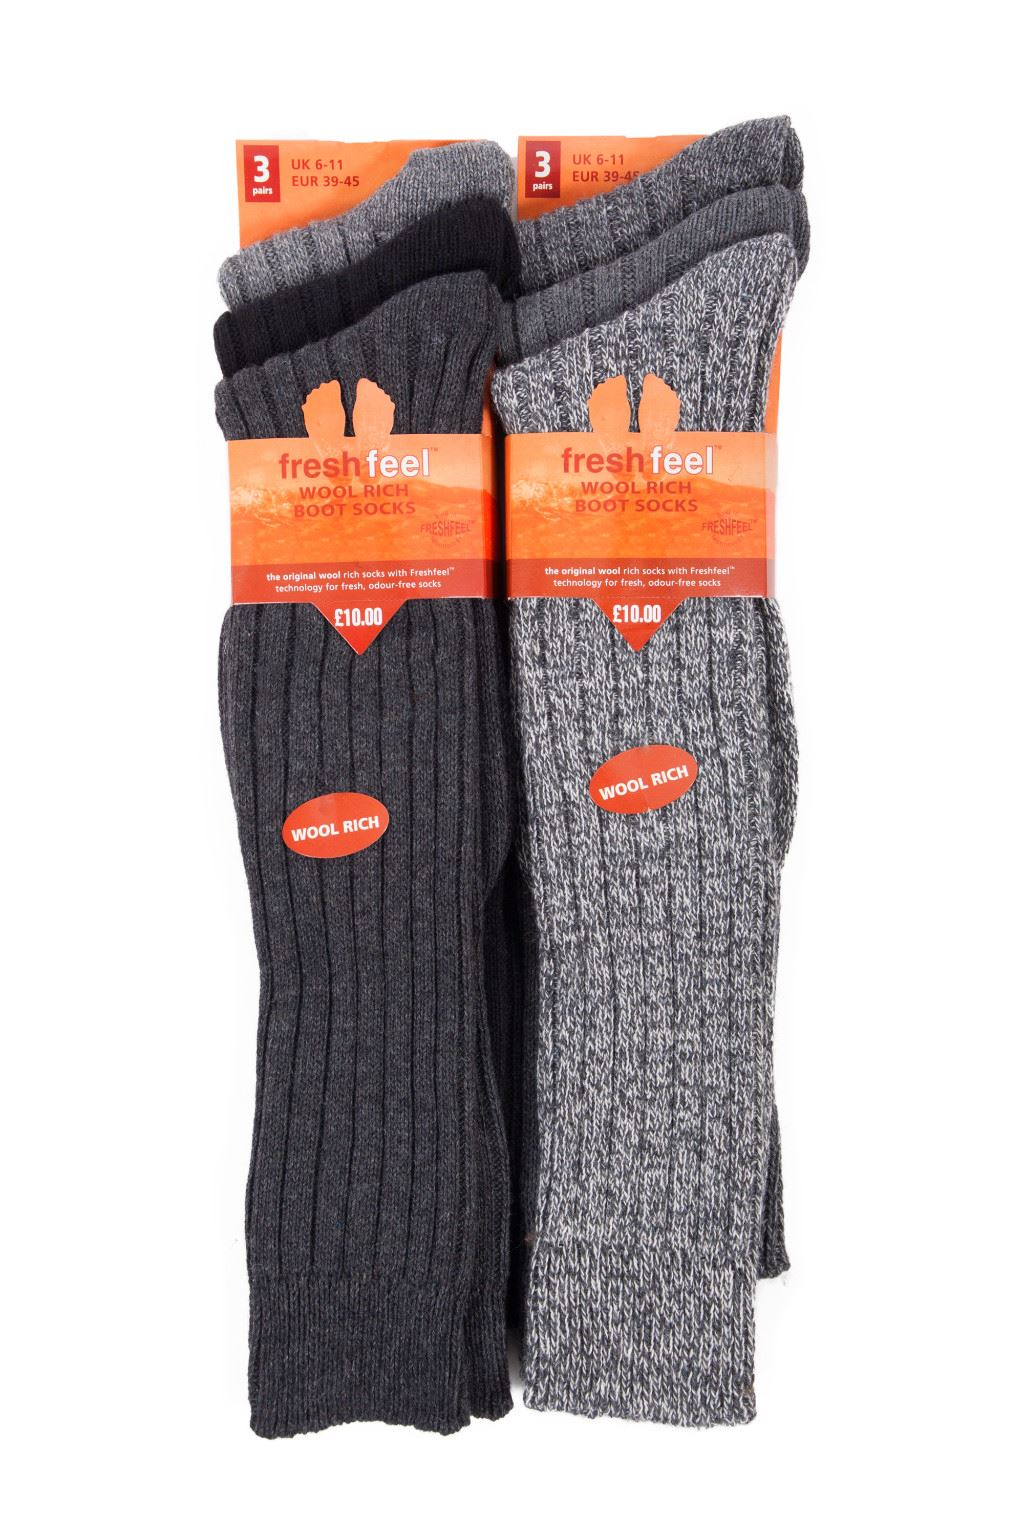 6pairs Mens Long Chunky Thermal Socks Walking Hiking Winter Warm Work Socks UK